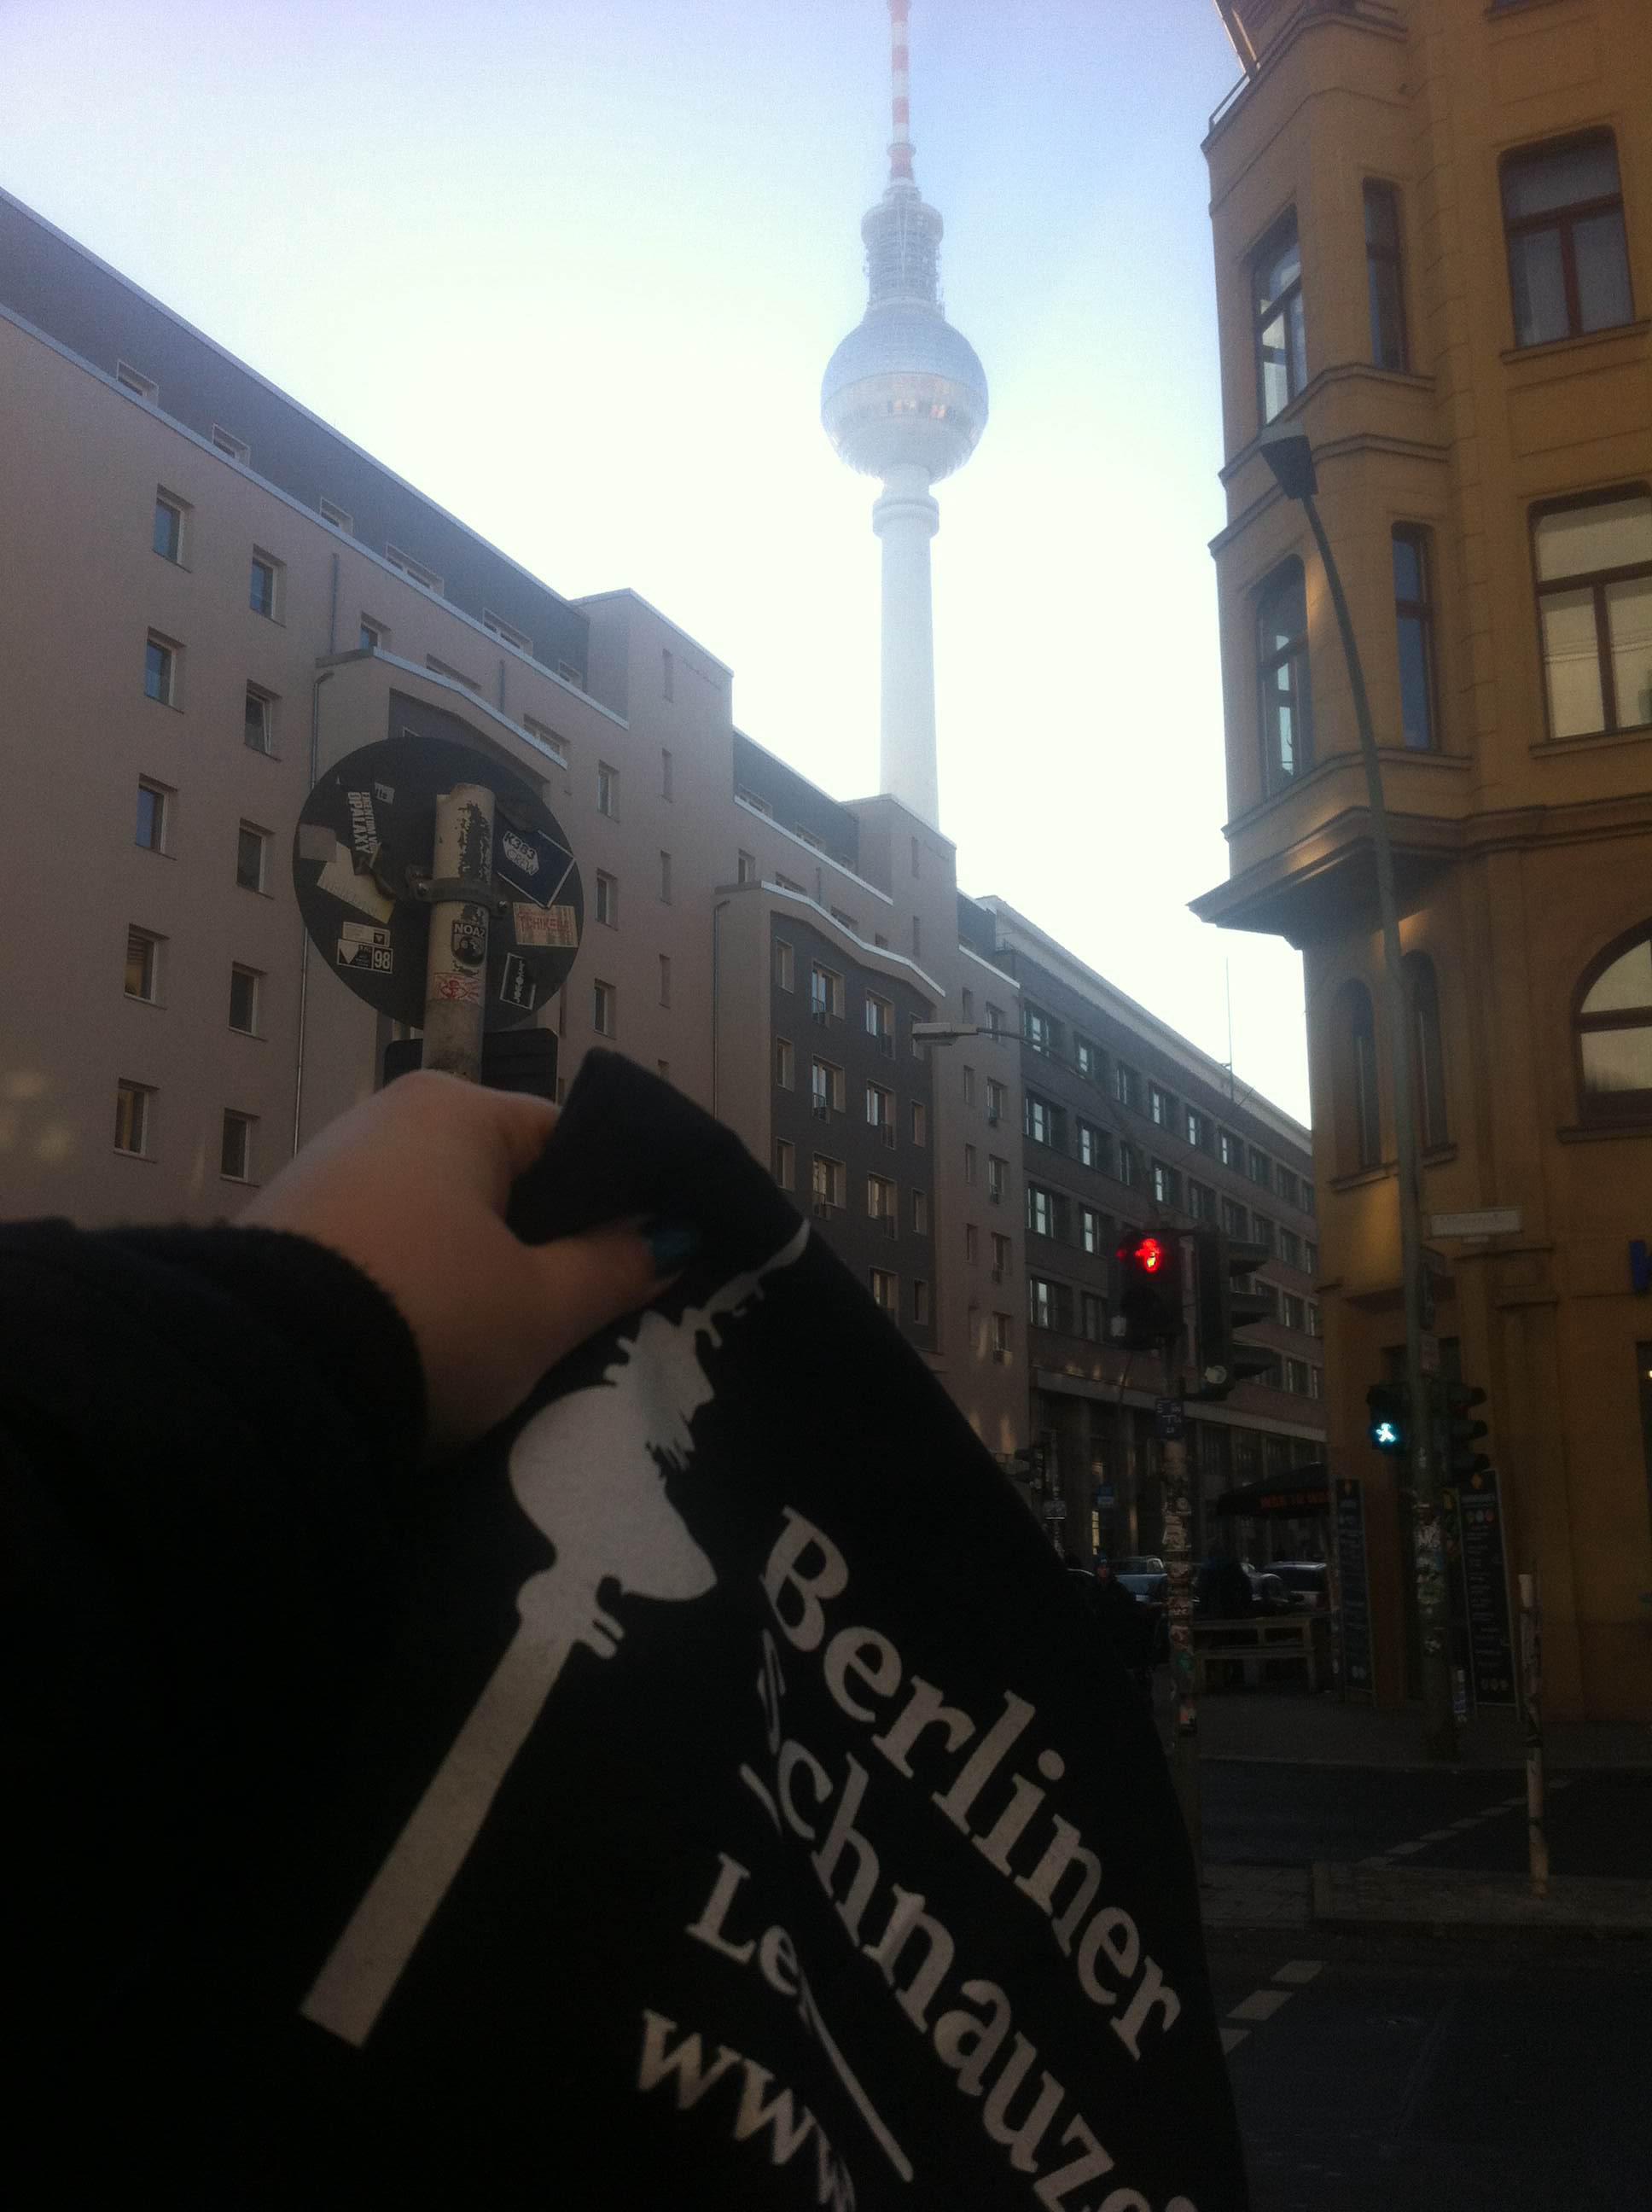 Kapitel Zwei Berlin impressionen